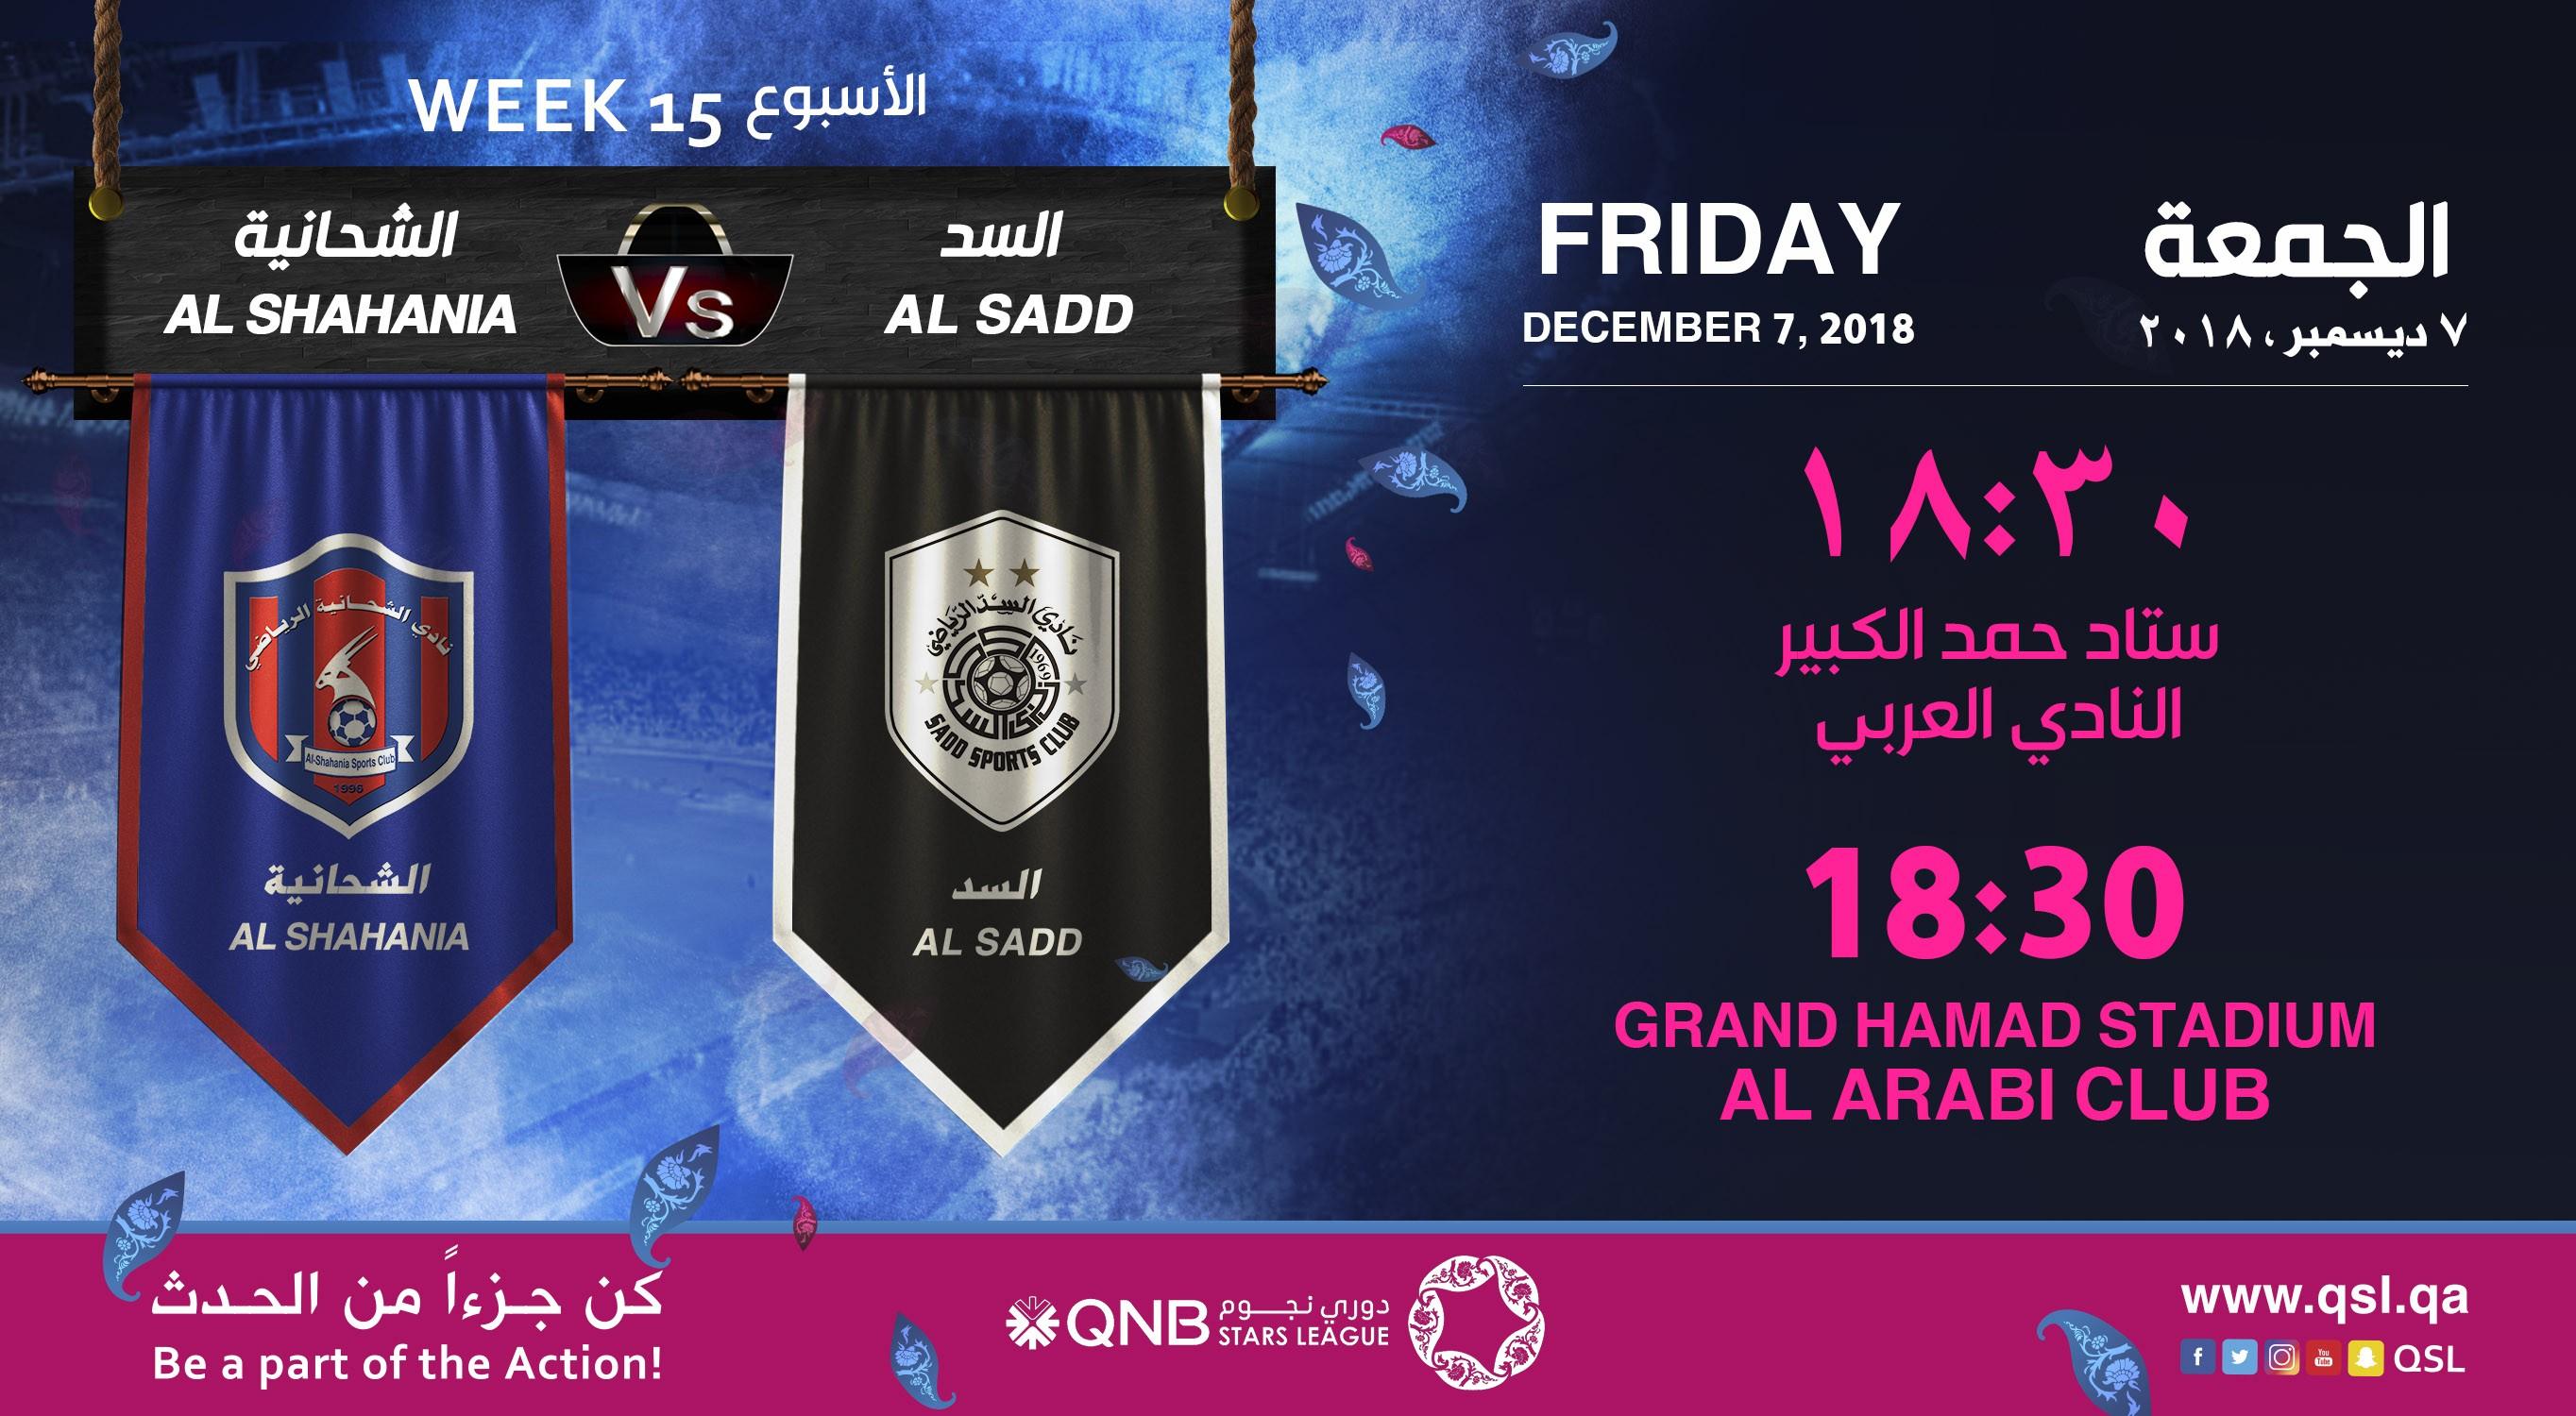 QNB Stars League Week 15 — Al Shahania vs Al Sadd